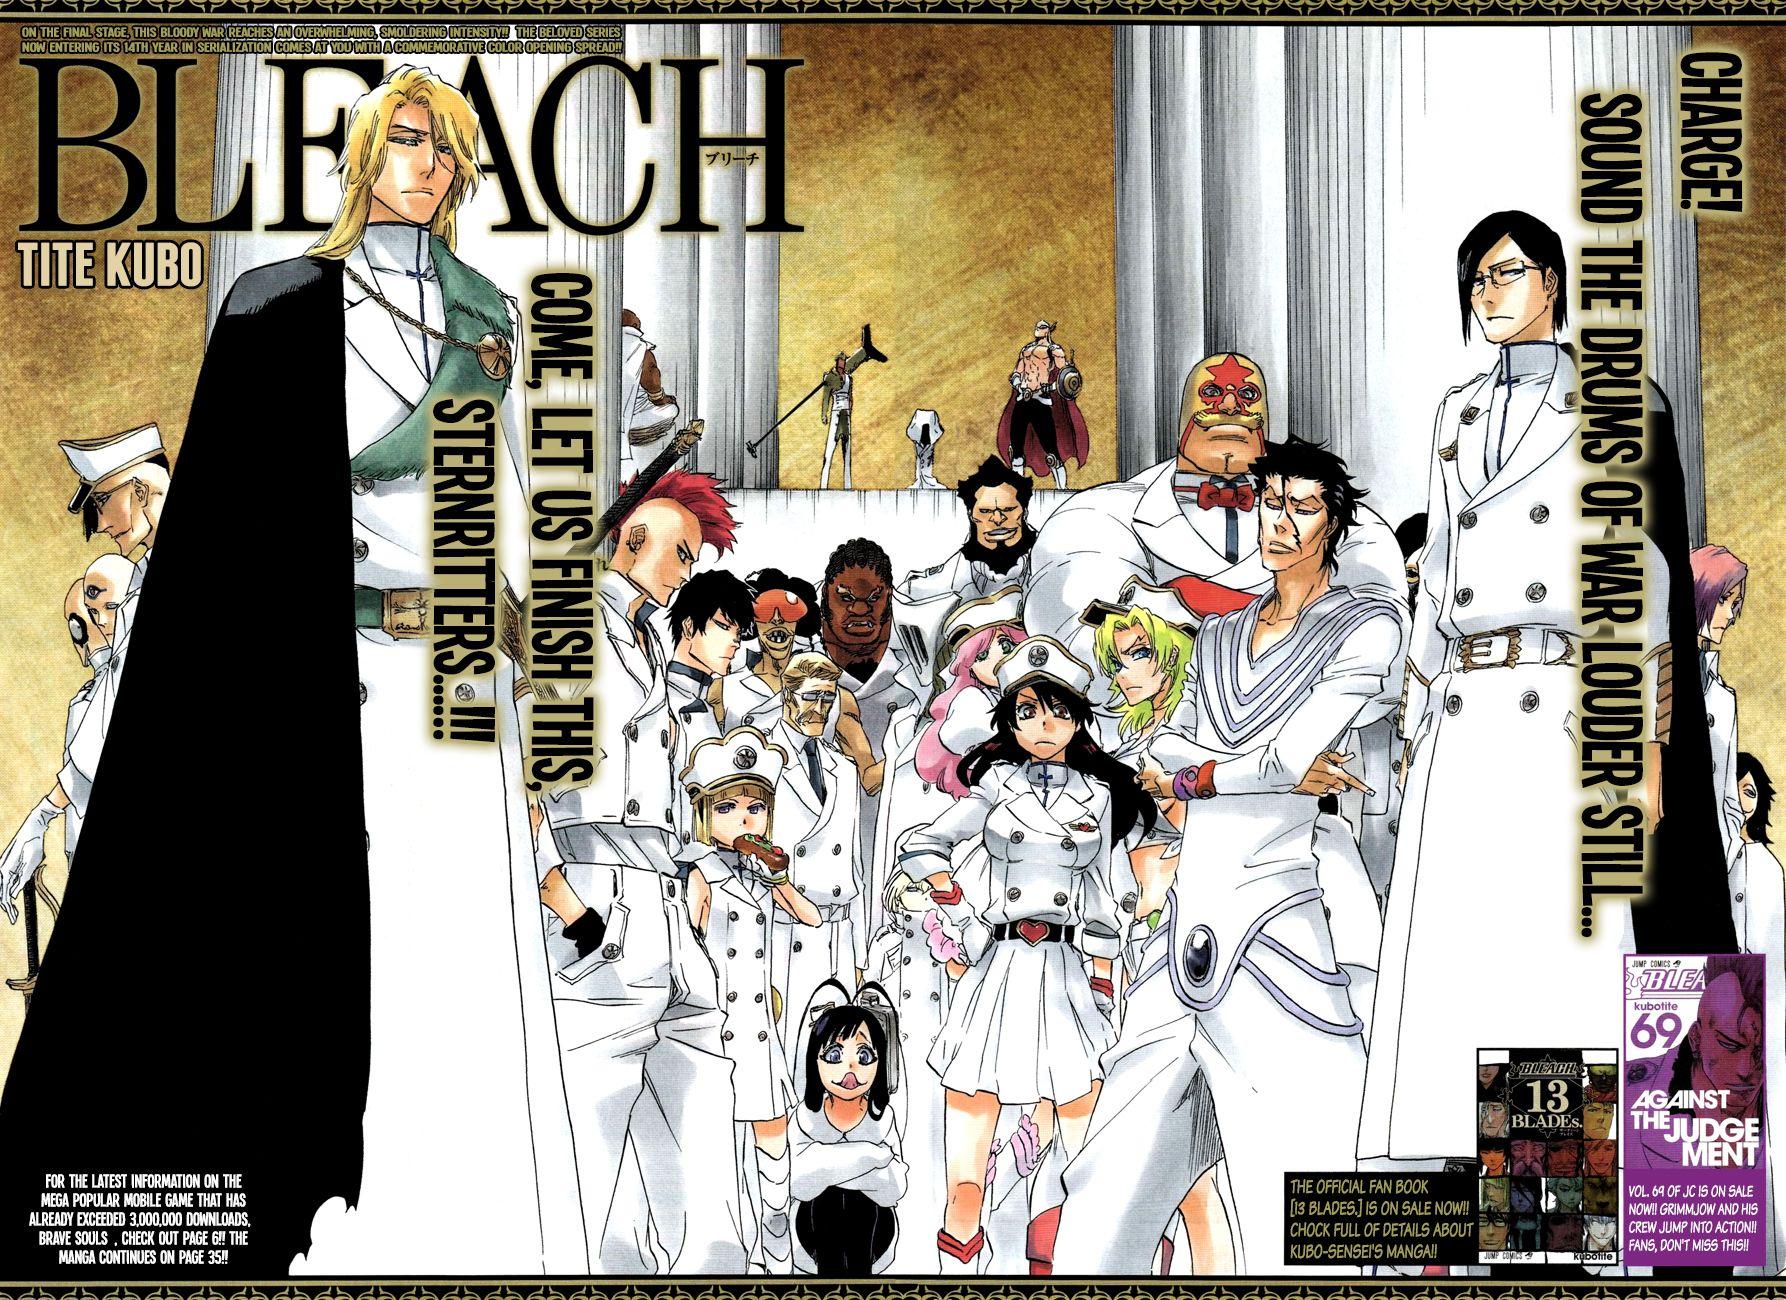 Bleach 640 - Page 4 - Manga Stream